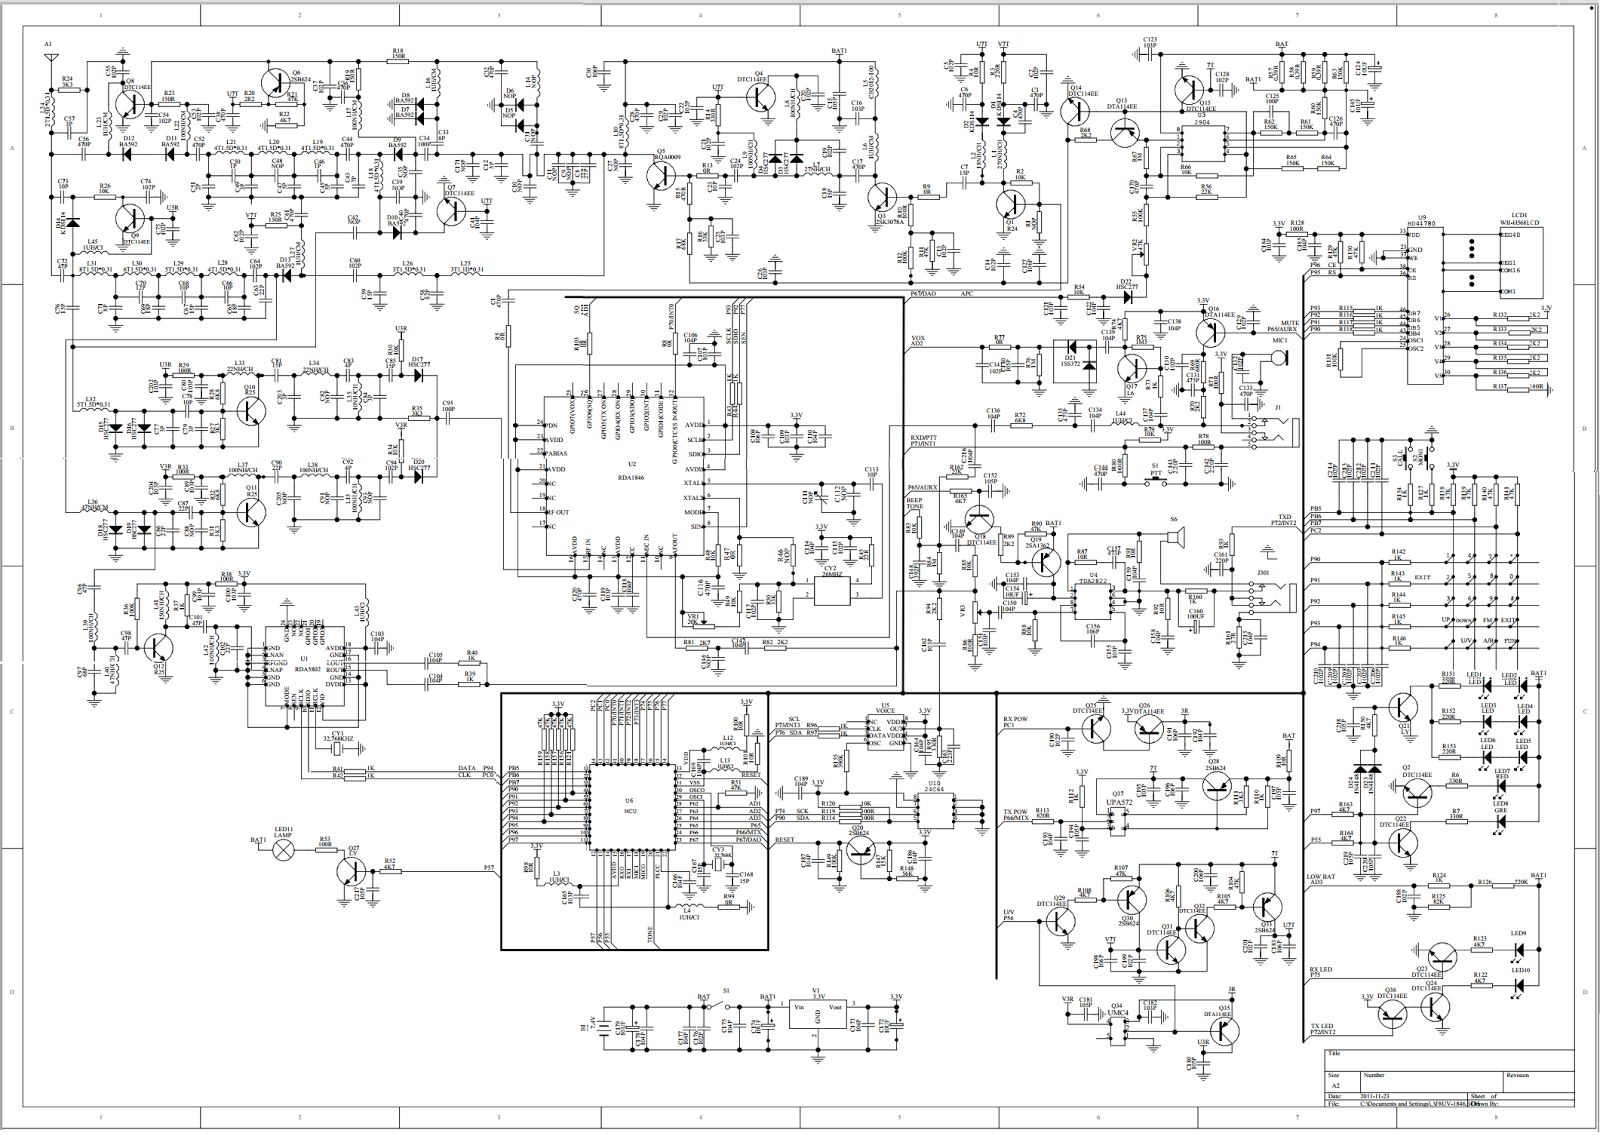 tyt microphone wiring diagram xlr microphone wiring